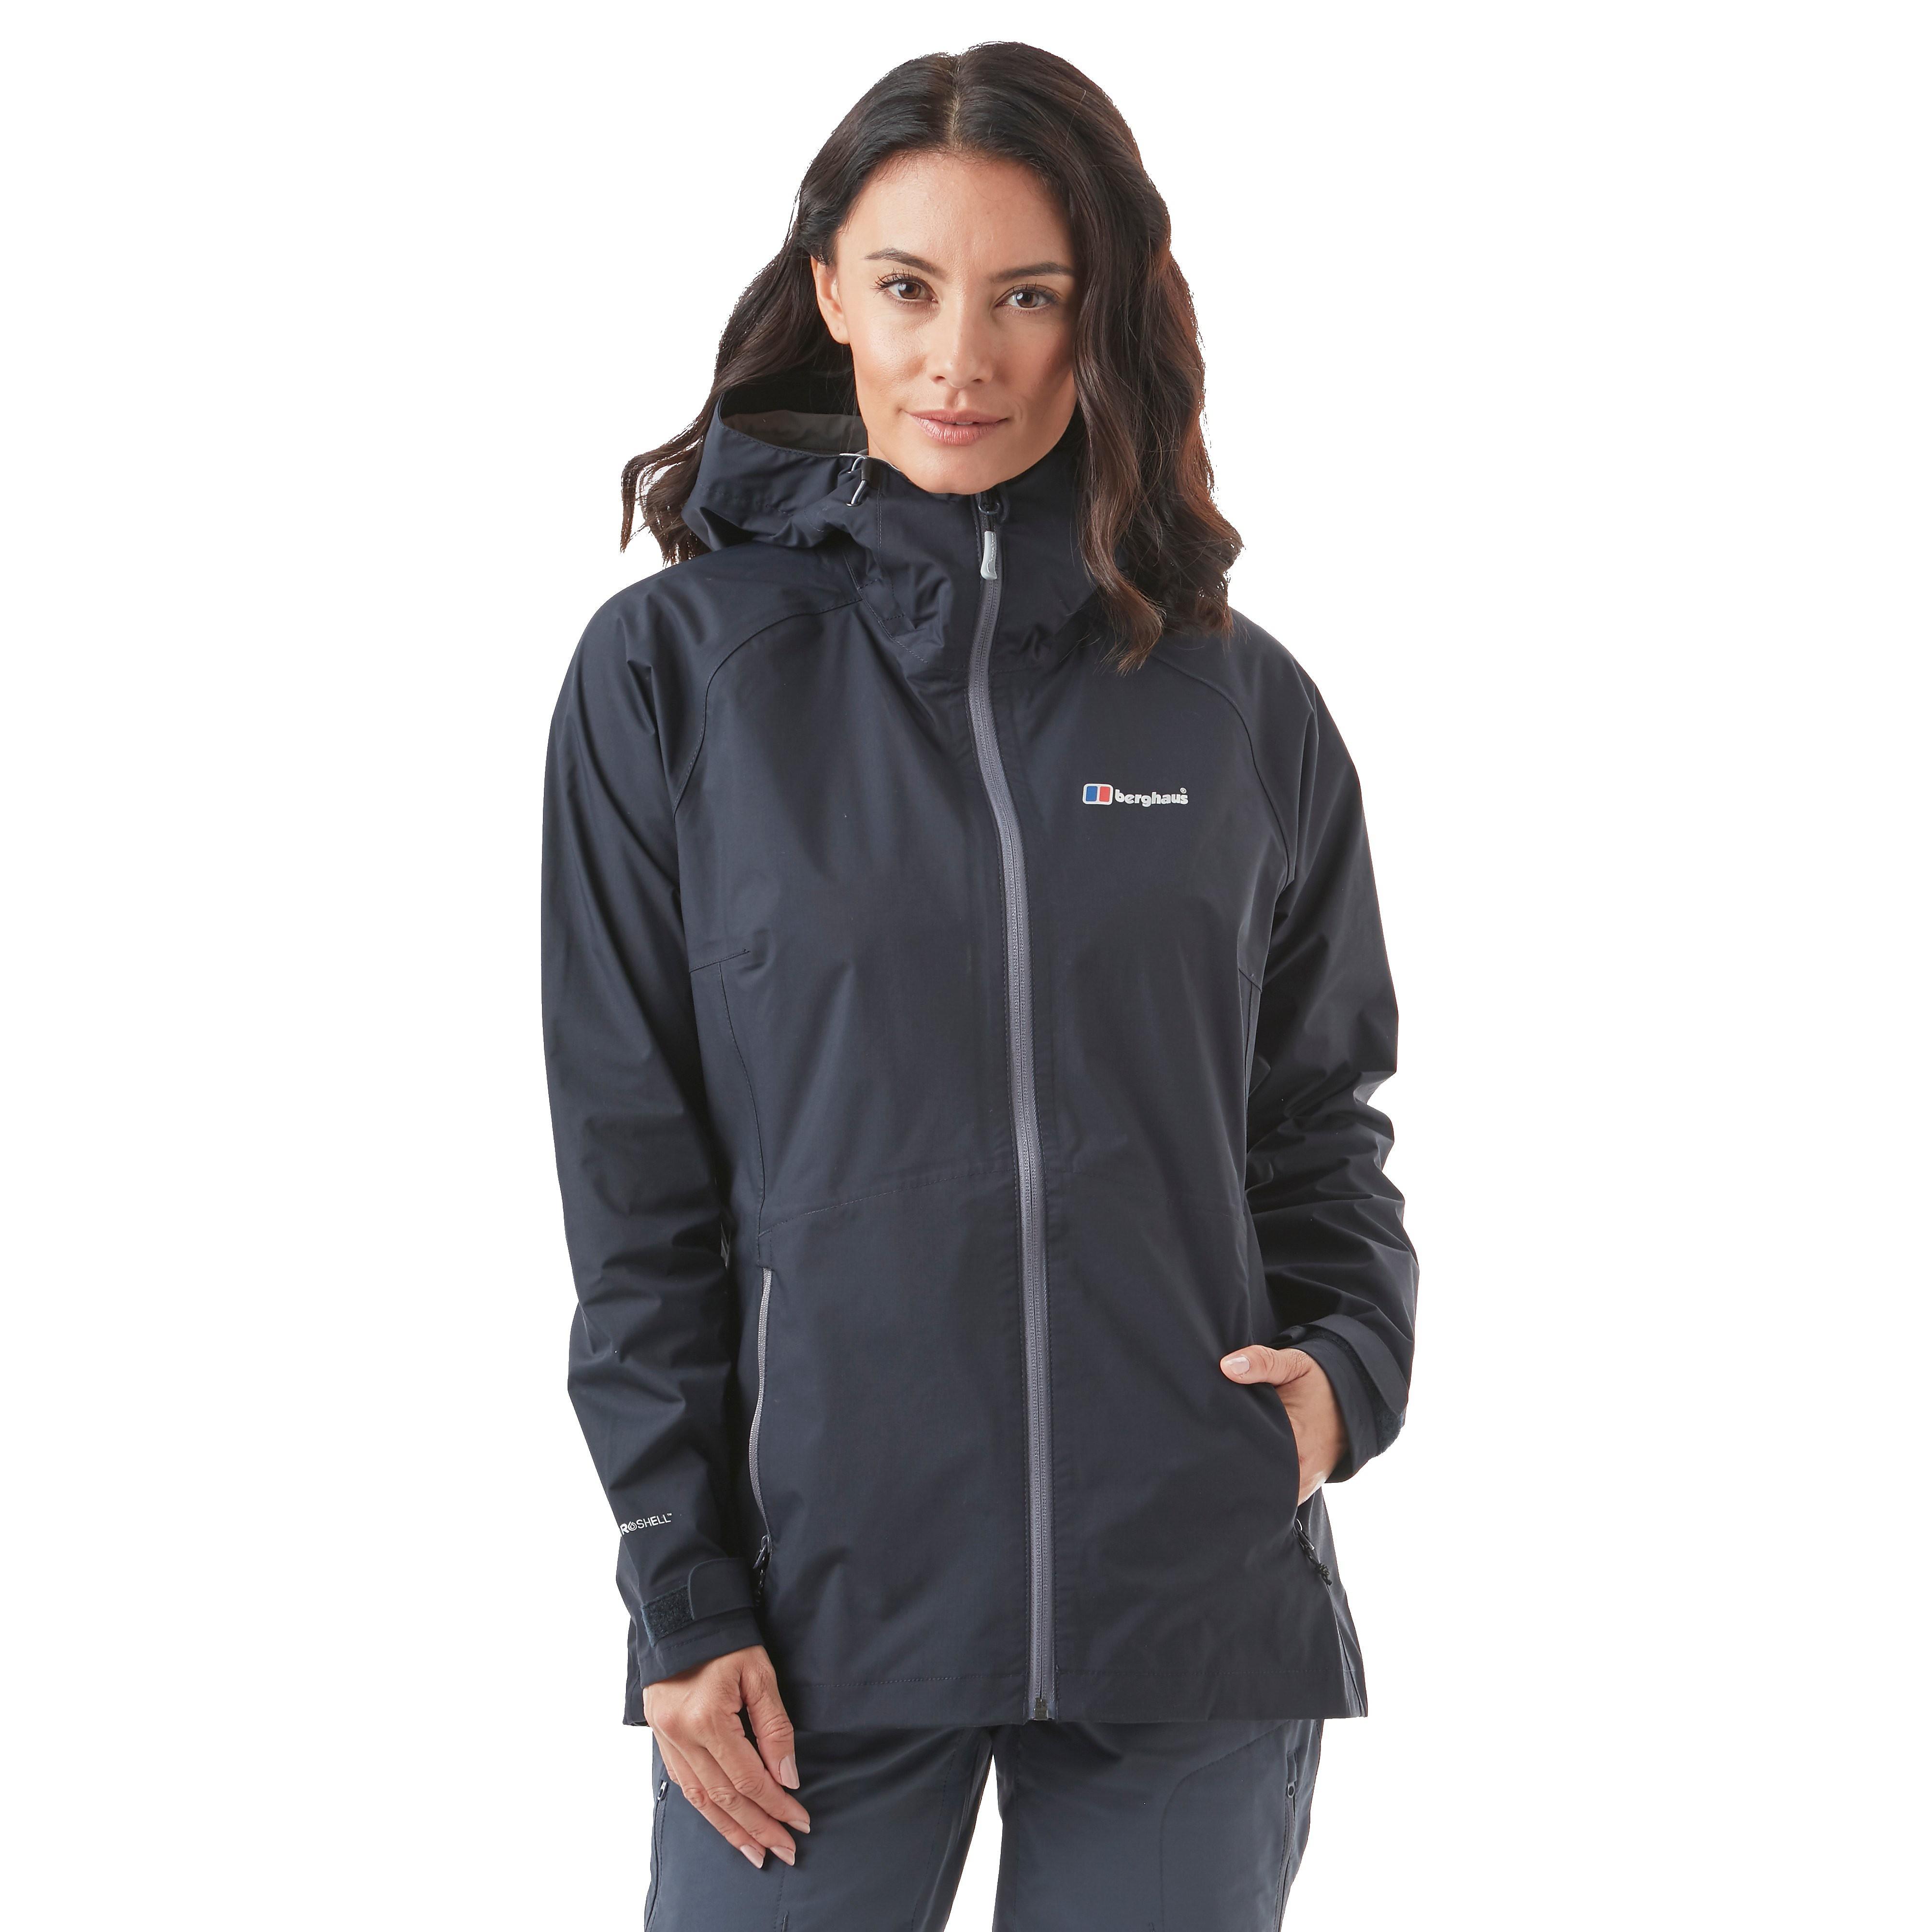 Berghaus Stormcloud Women's Jacket